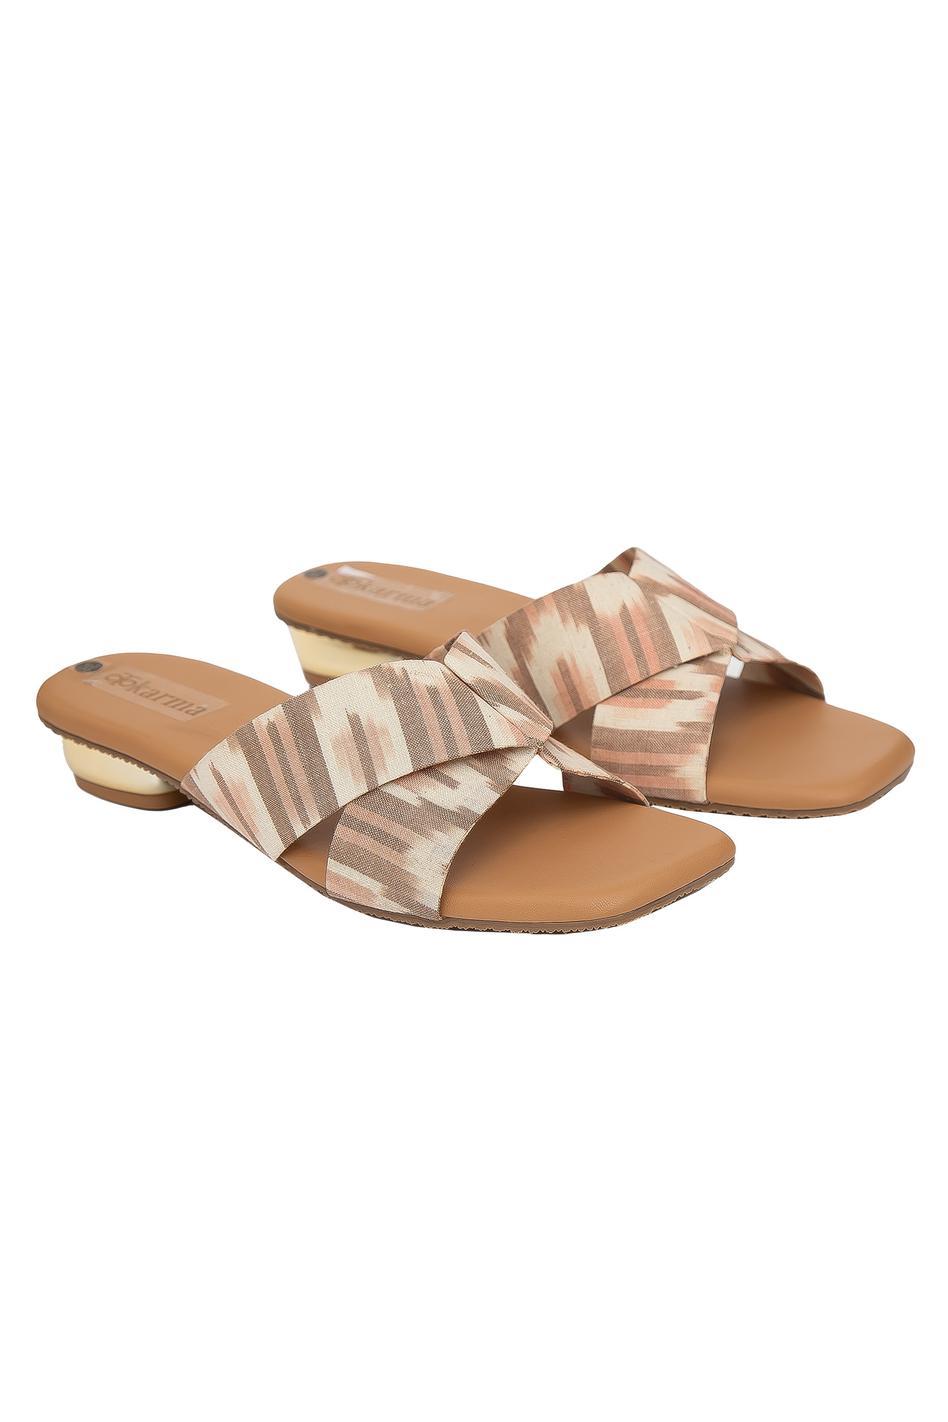 Maahru Ikat Square Toe Sandals